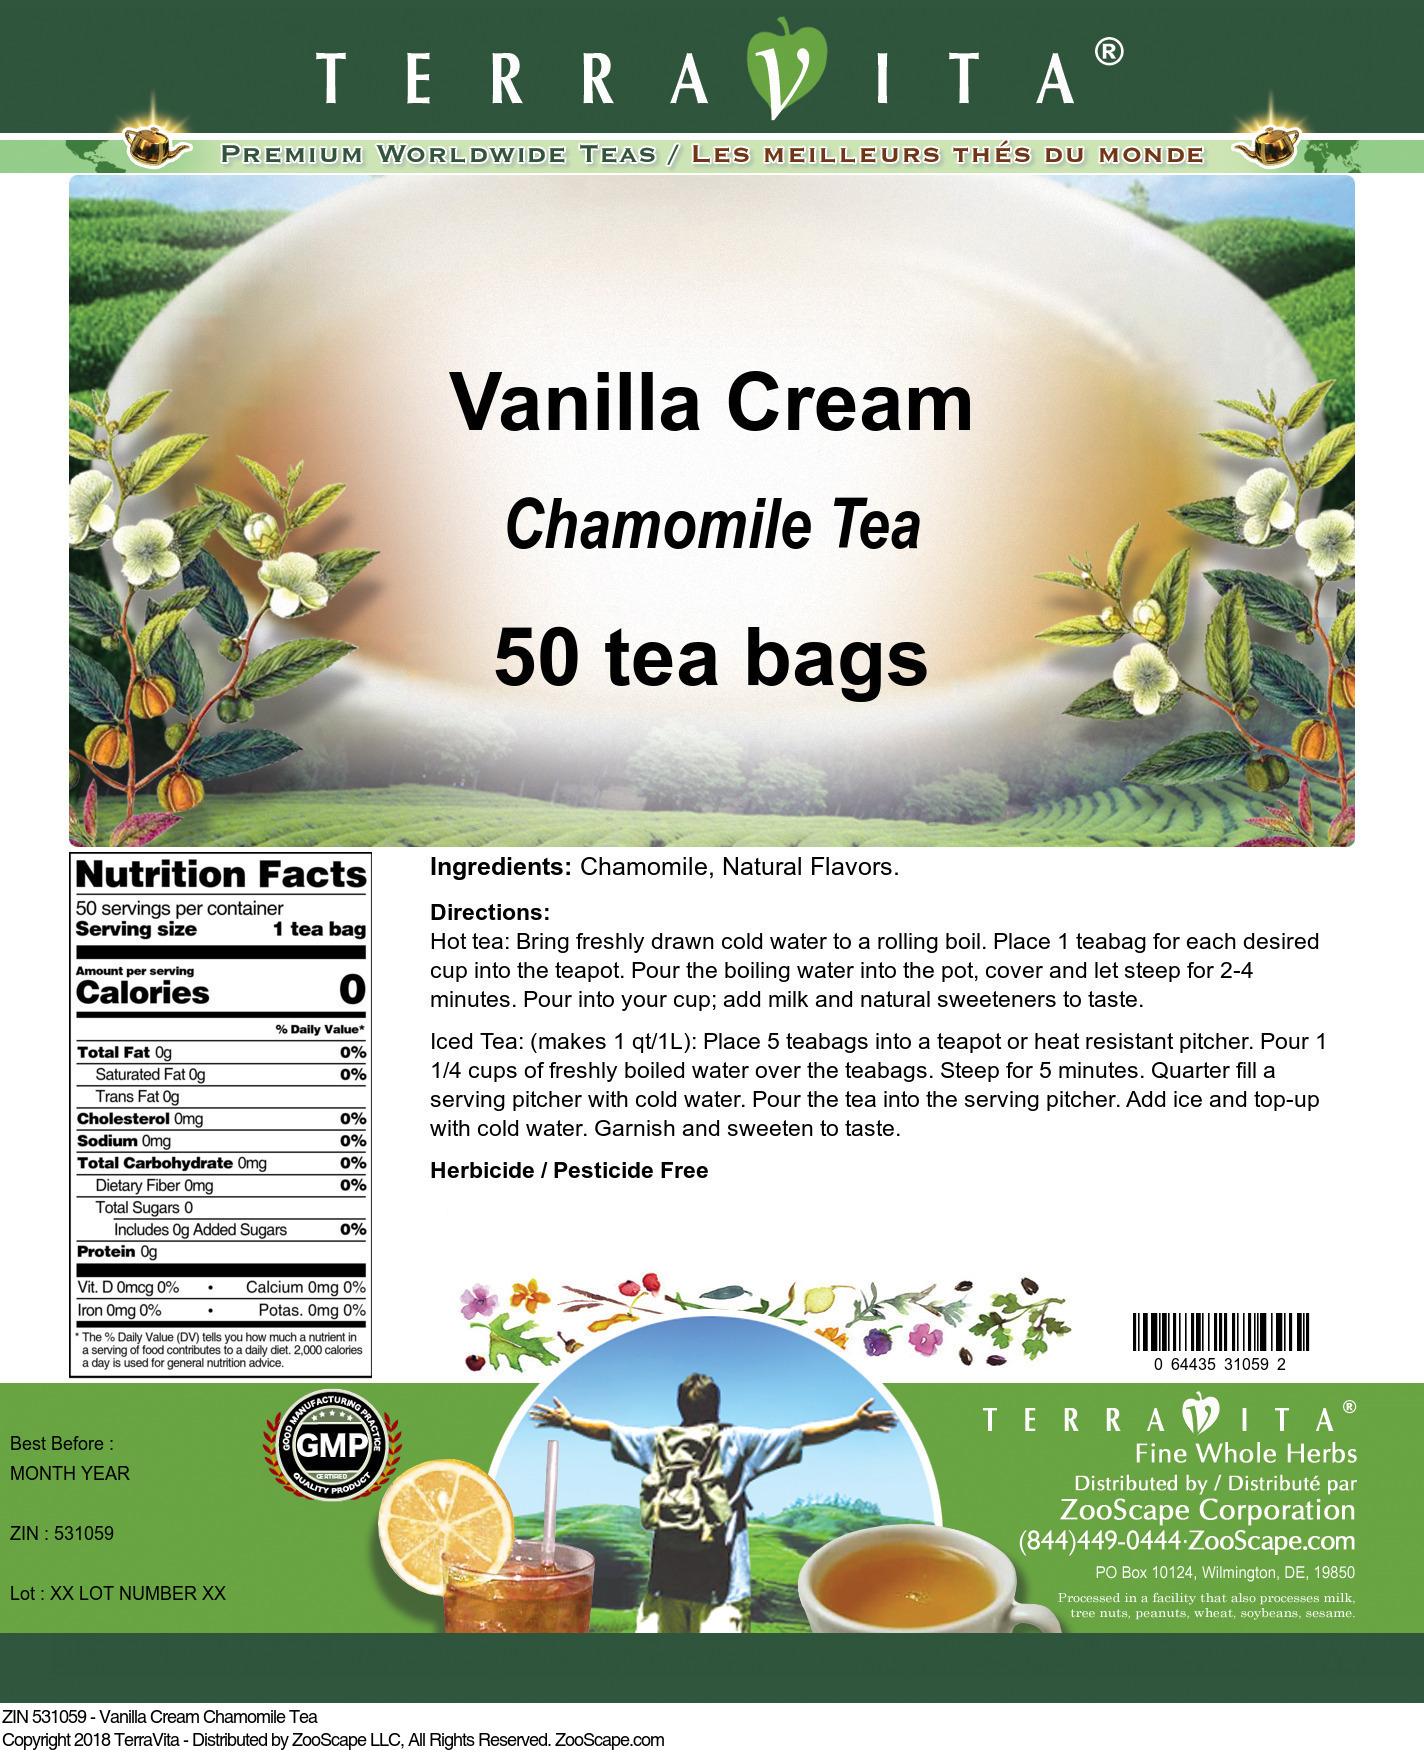 Vanilla Cream Chamomile Tea